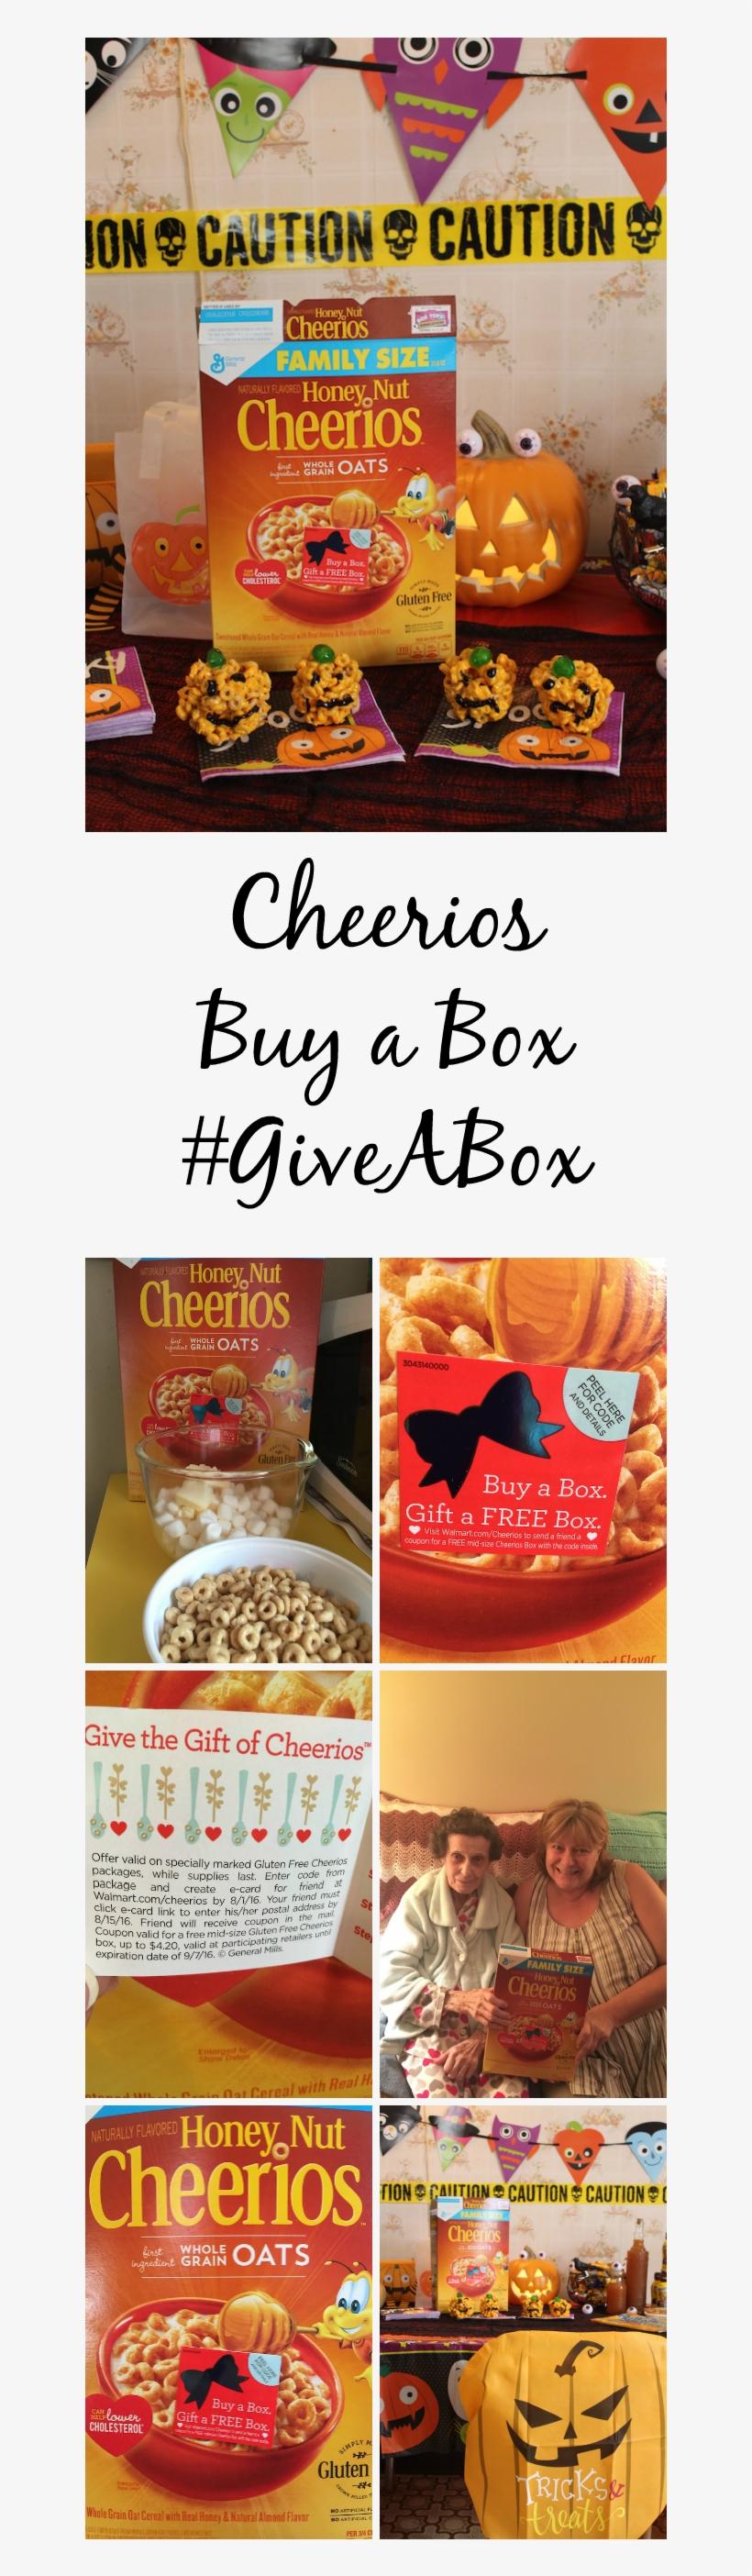 Cheerios Buy A Box Give A Box 24 - Cheerios Honey Nut Cereal - 21.6 Oz Box, transparent png #5804498